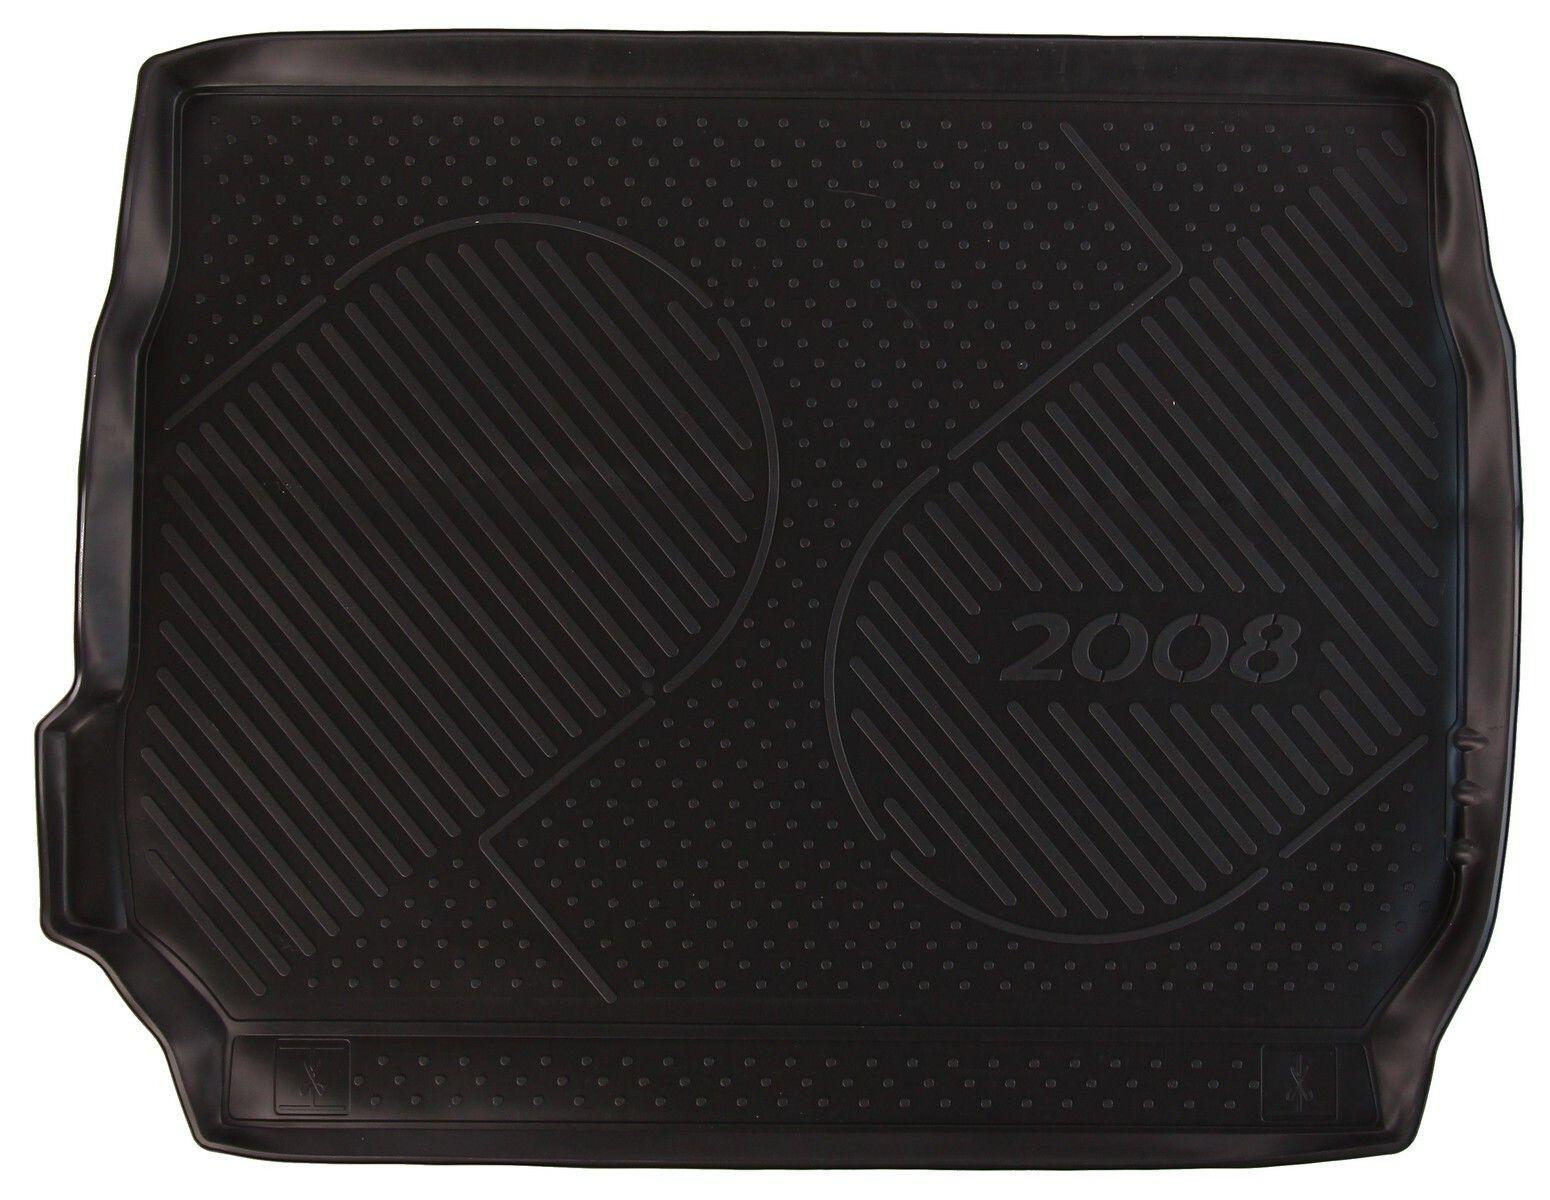 Vana do kufru gumová PEUGEOT SUV 2008-2014